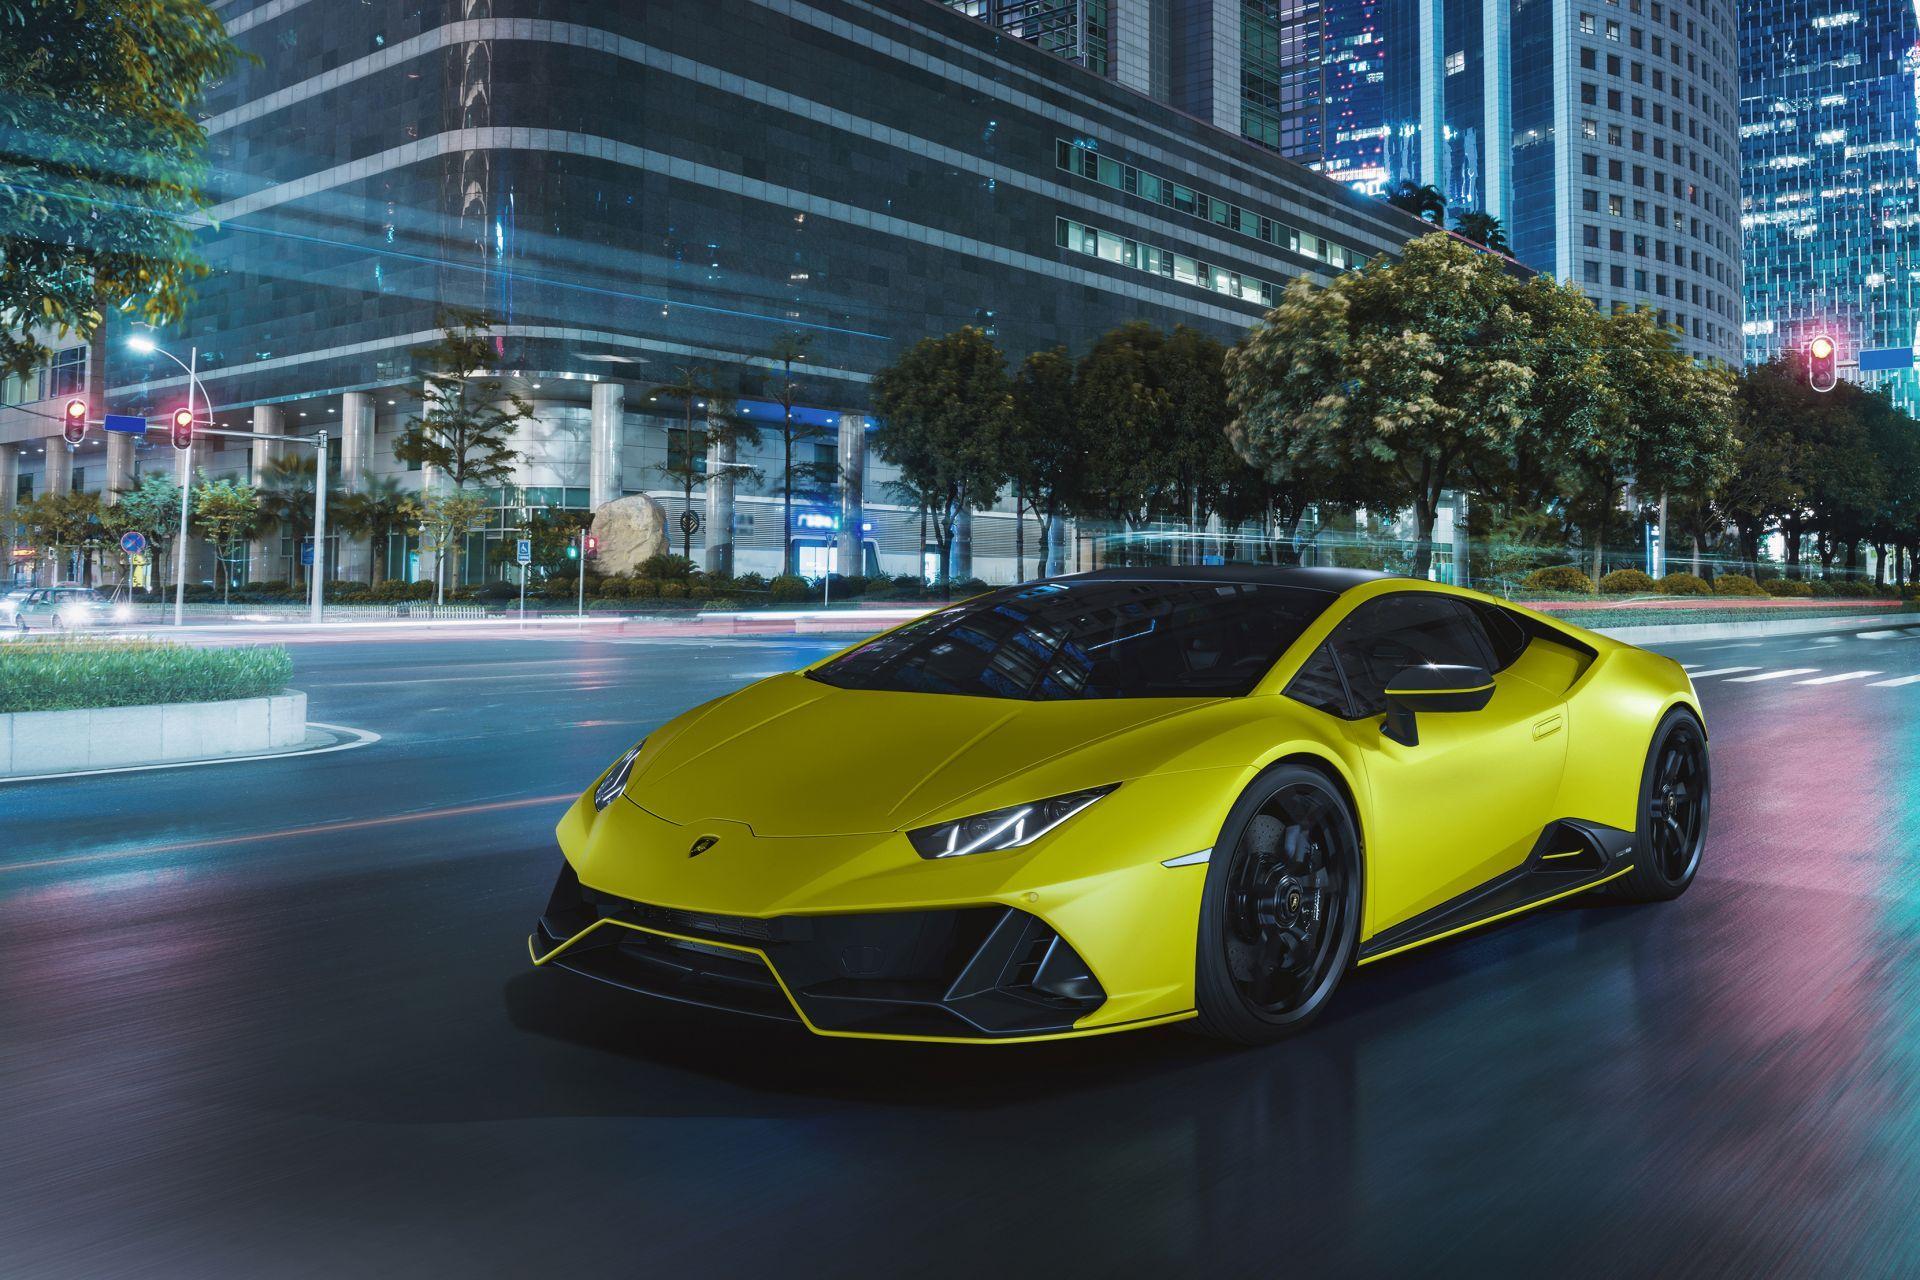 Lamborghini-Huracan-Evo-Fluo-Capsule-4